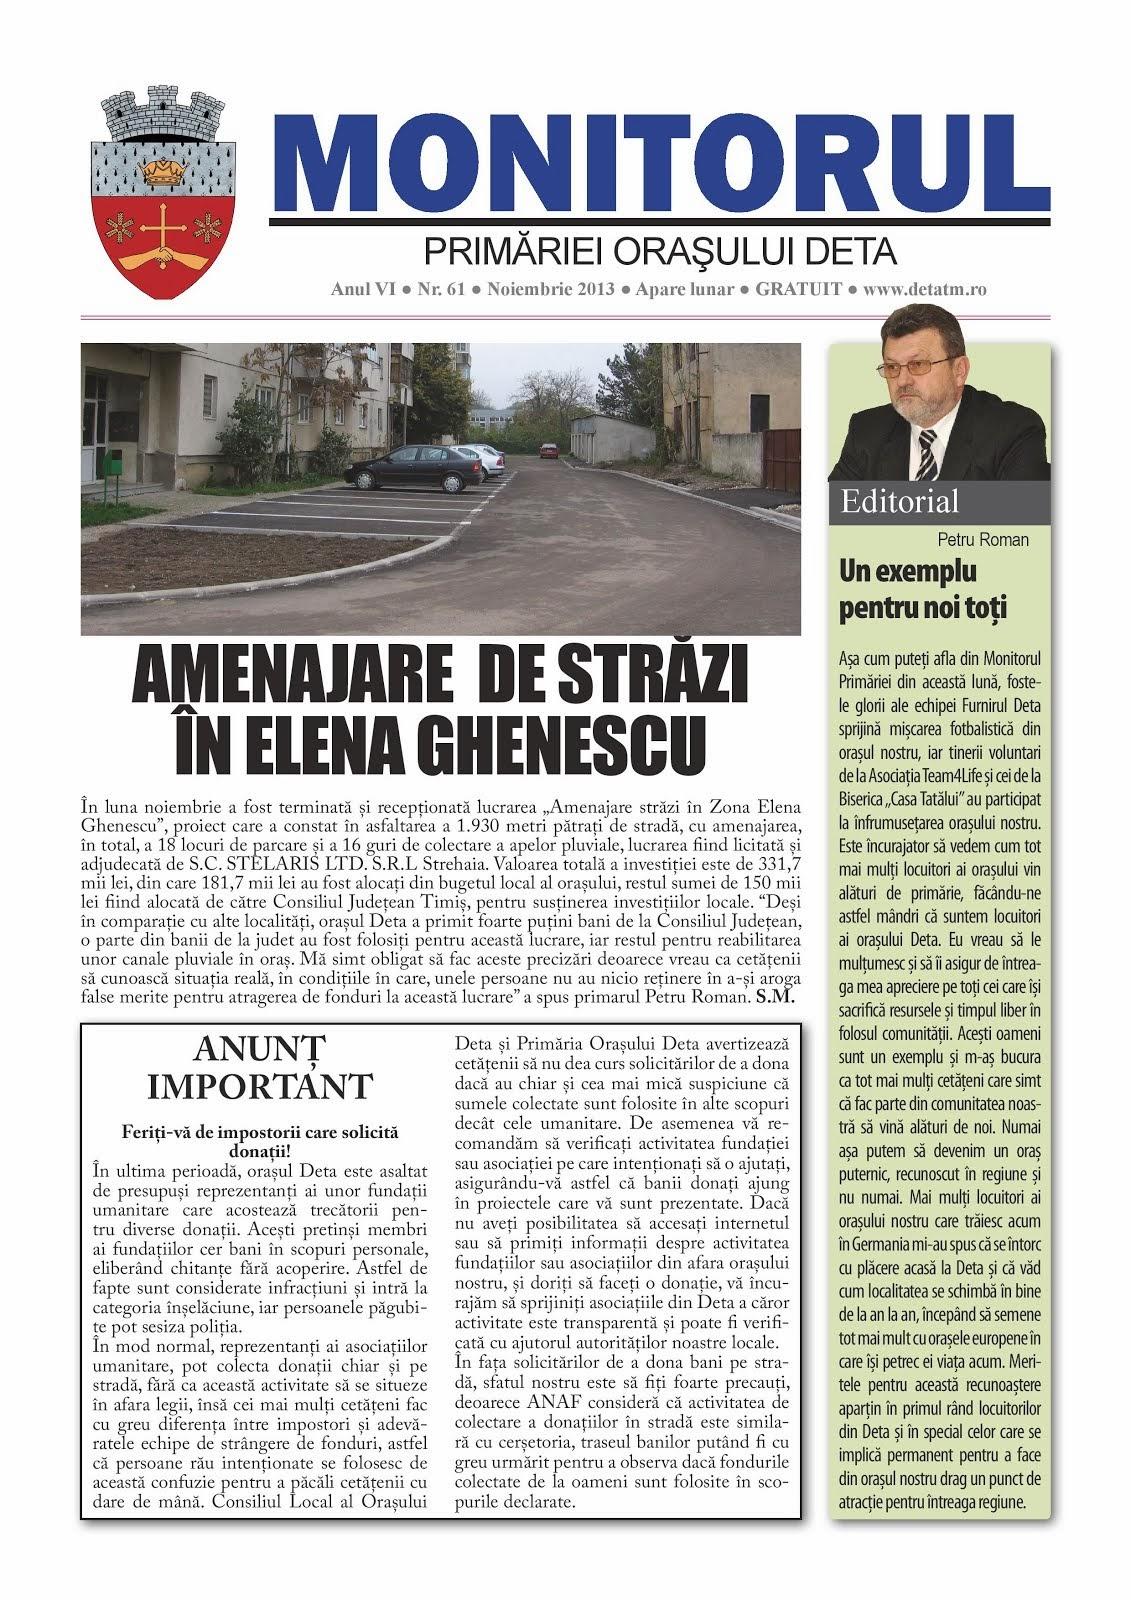 Monitorul - noiembrie 2013